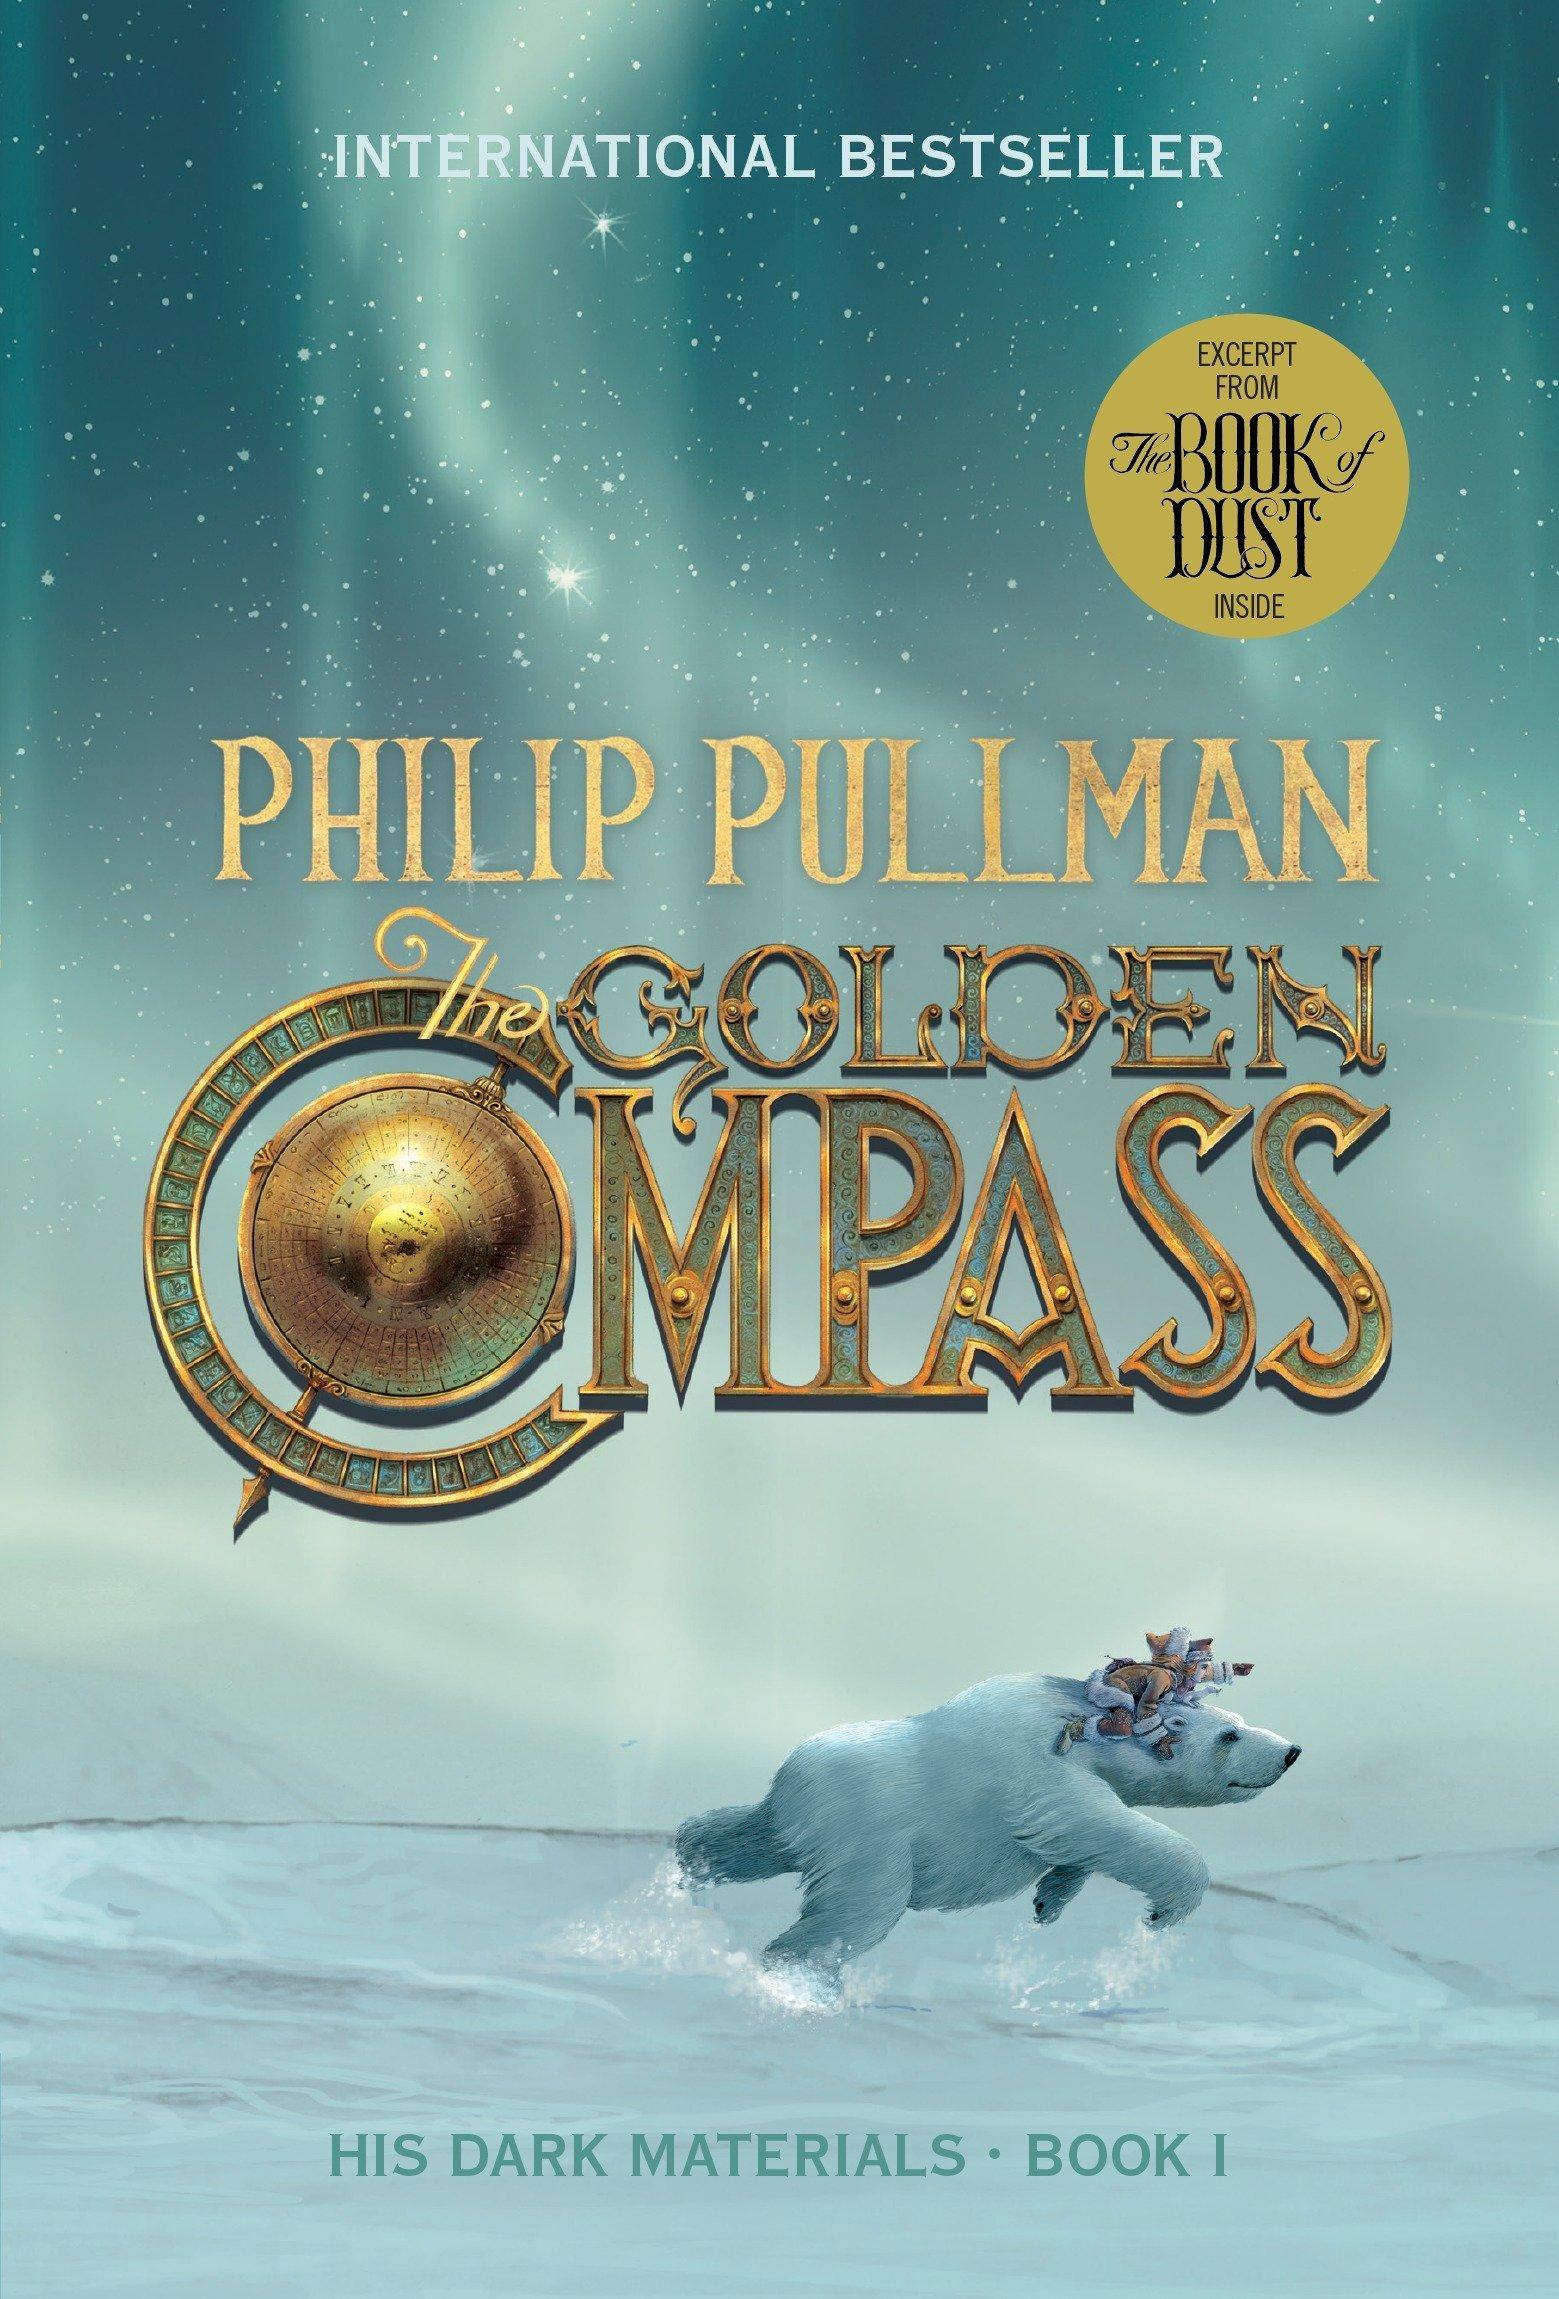 The Golden Compass: His Dark Materials: Amazon.es: Philip Pullman: Libros en idiomas extranjeros